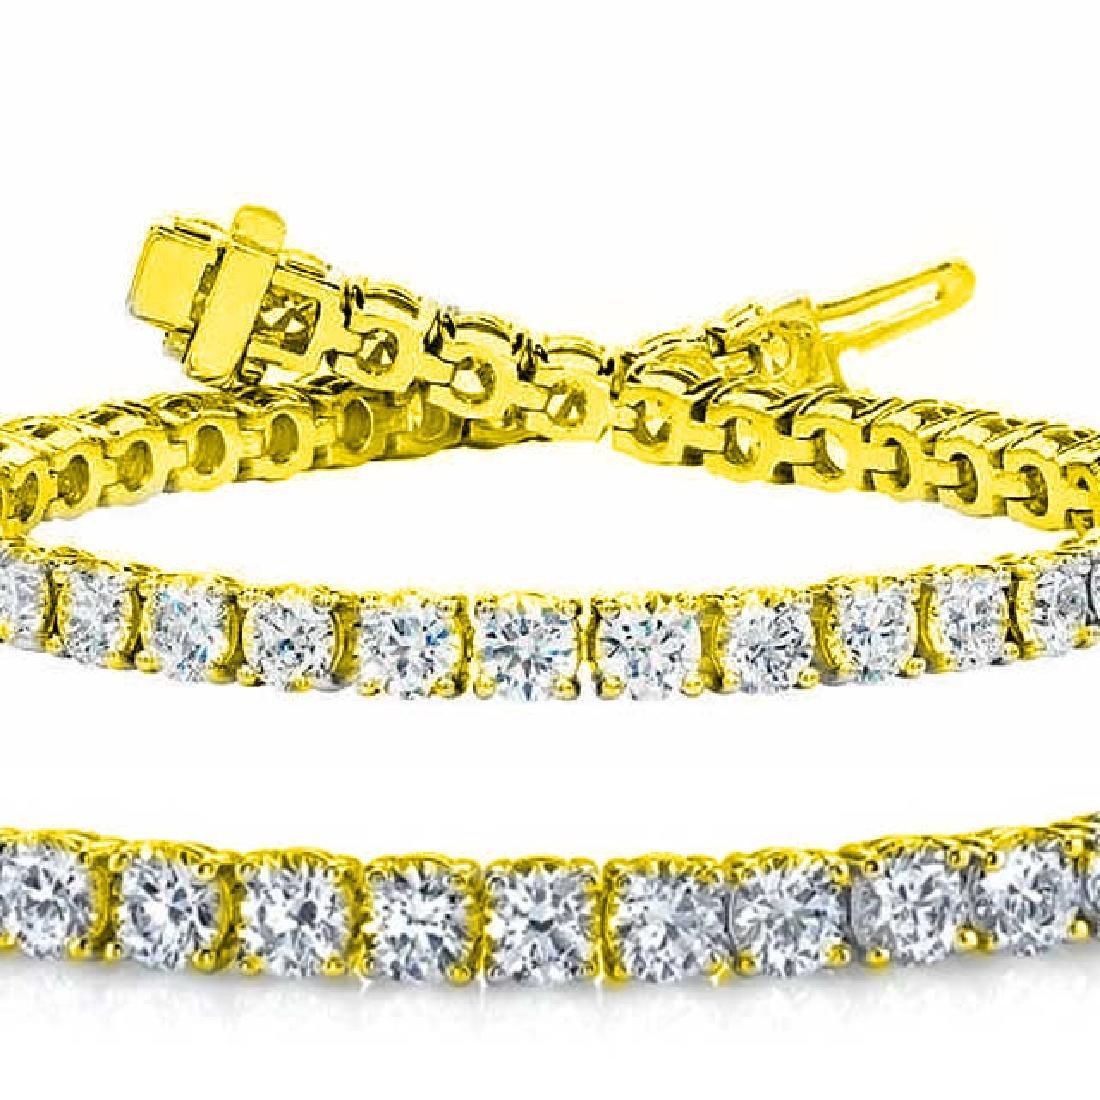 Natural 10ct VS-SI Diamond Tennis Bracelet 18K Yellow